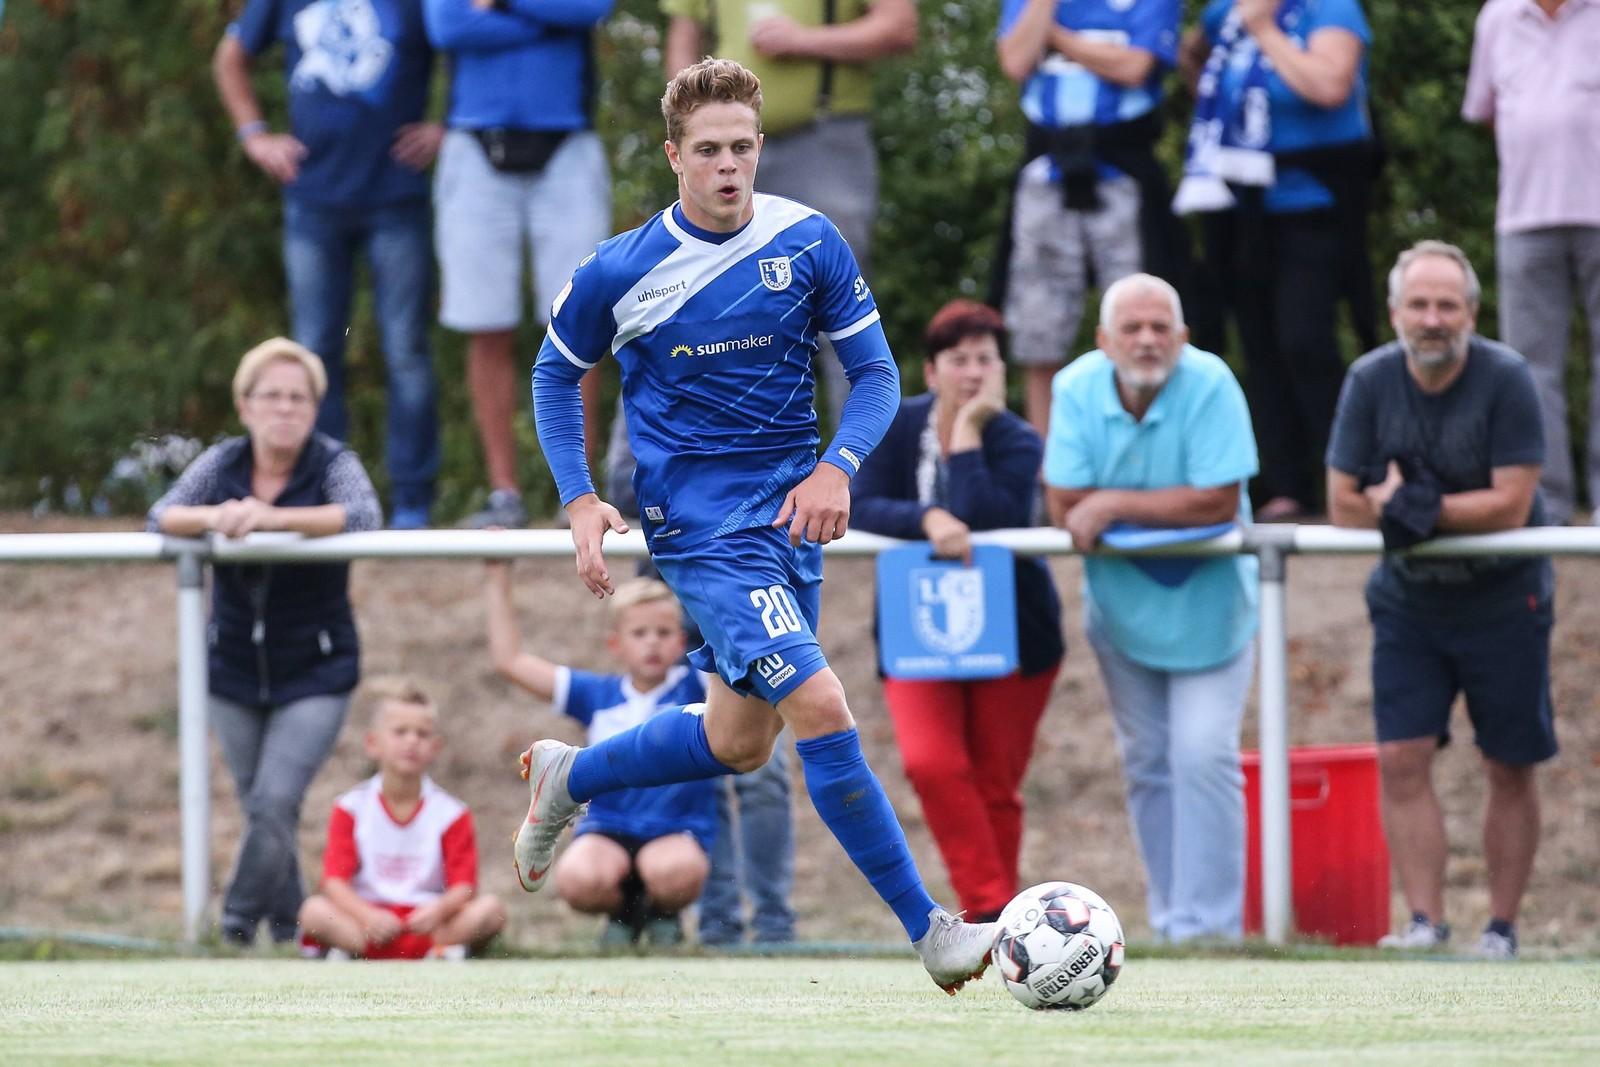 Joel Abu Hanna am Ball für den 1. FC Magdeburg